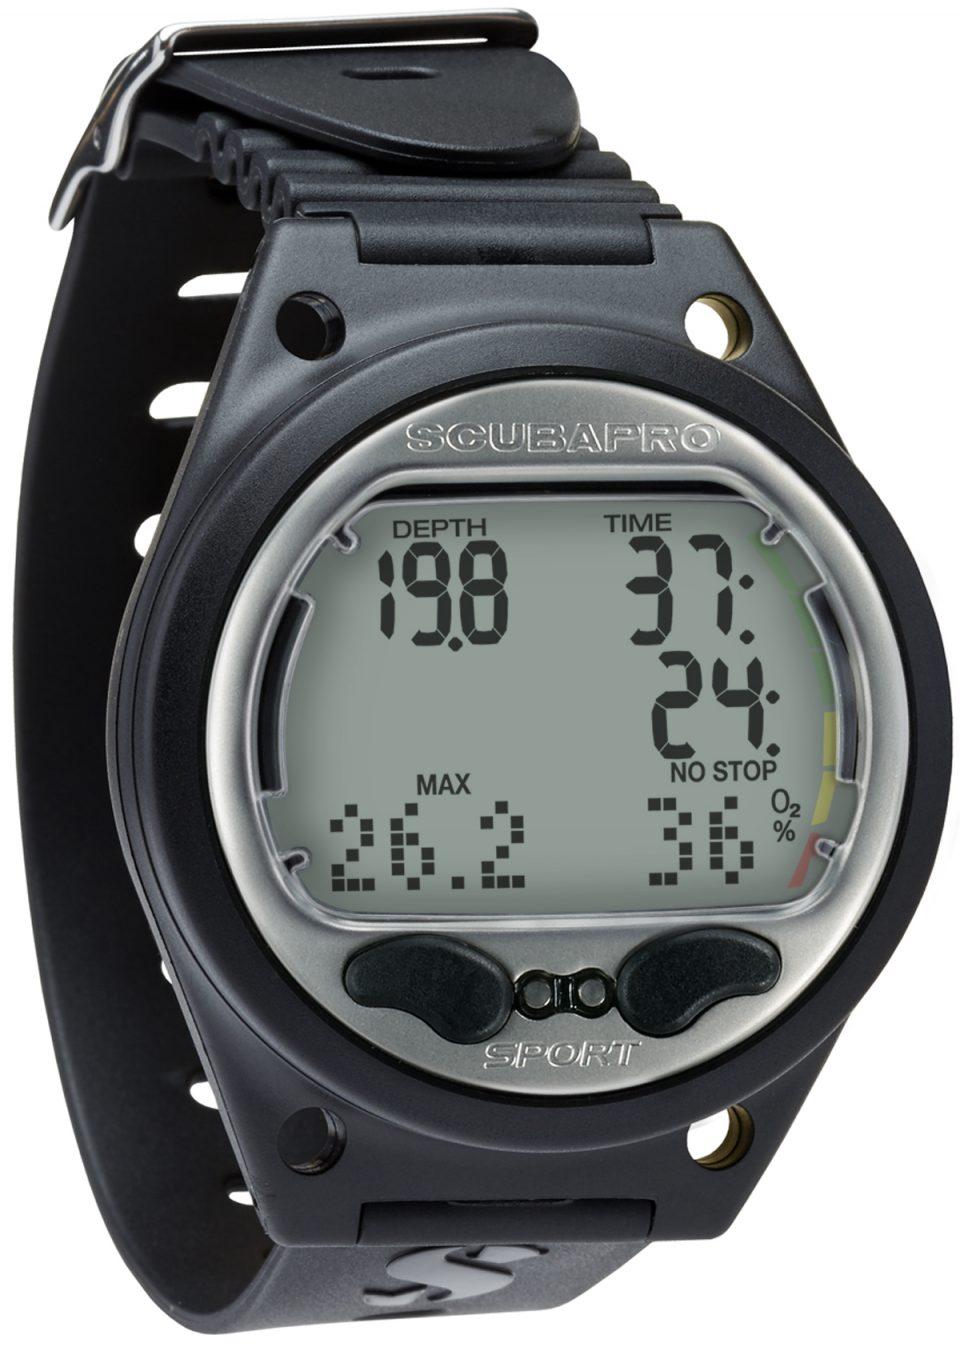 Aladin-Sport_wrist-computer_Metric.jpg